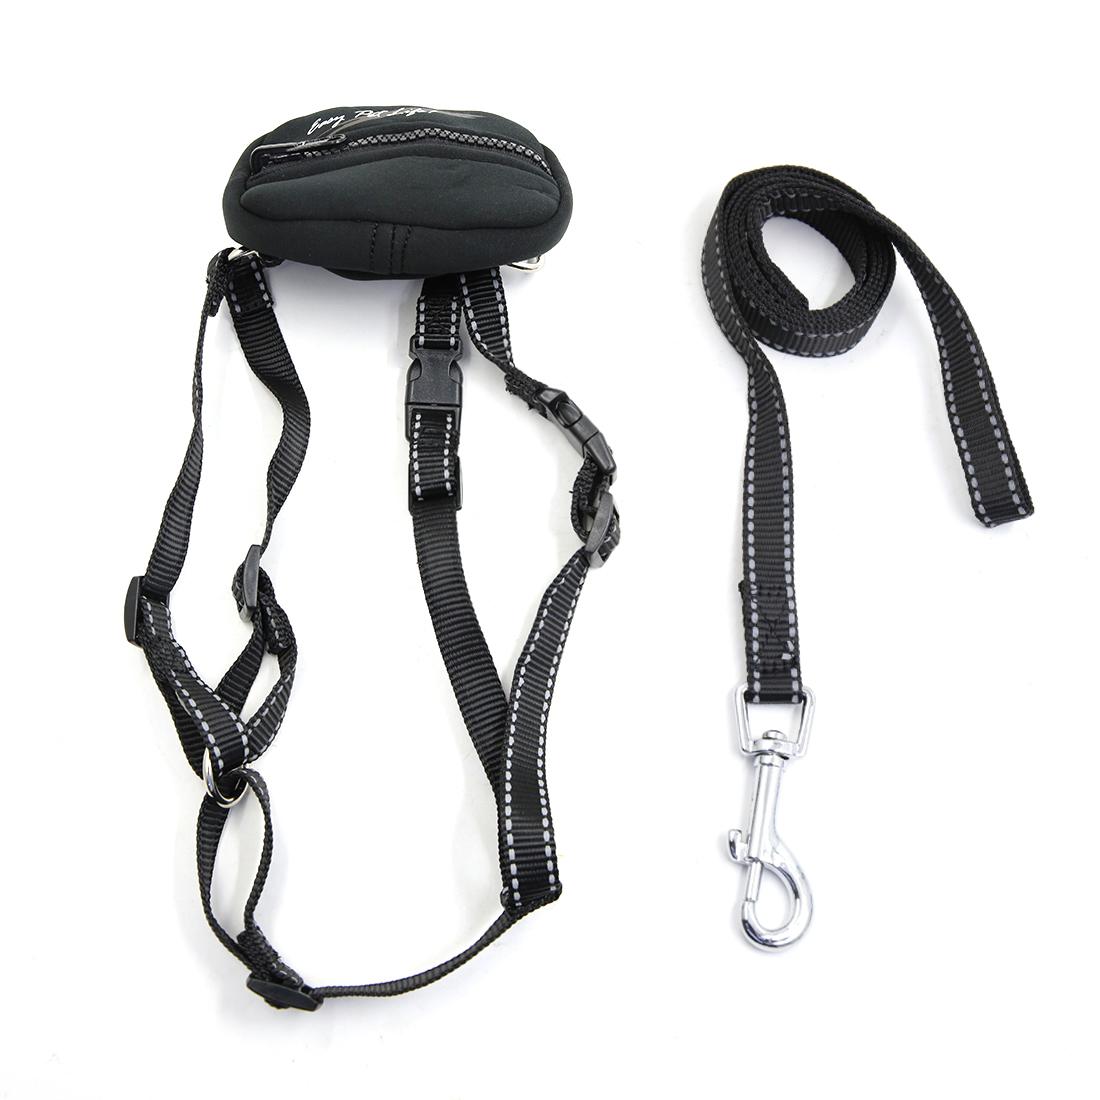 Safe Reflective Dog Harness Leash Adjustable Nylon Collar For Walking with Storage Bag Black M